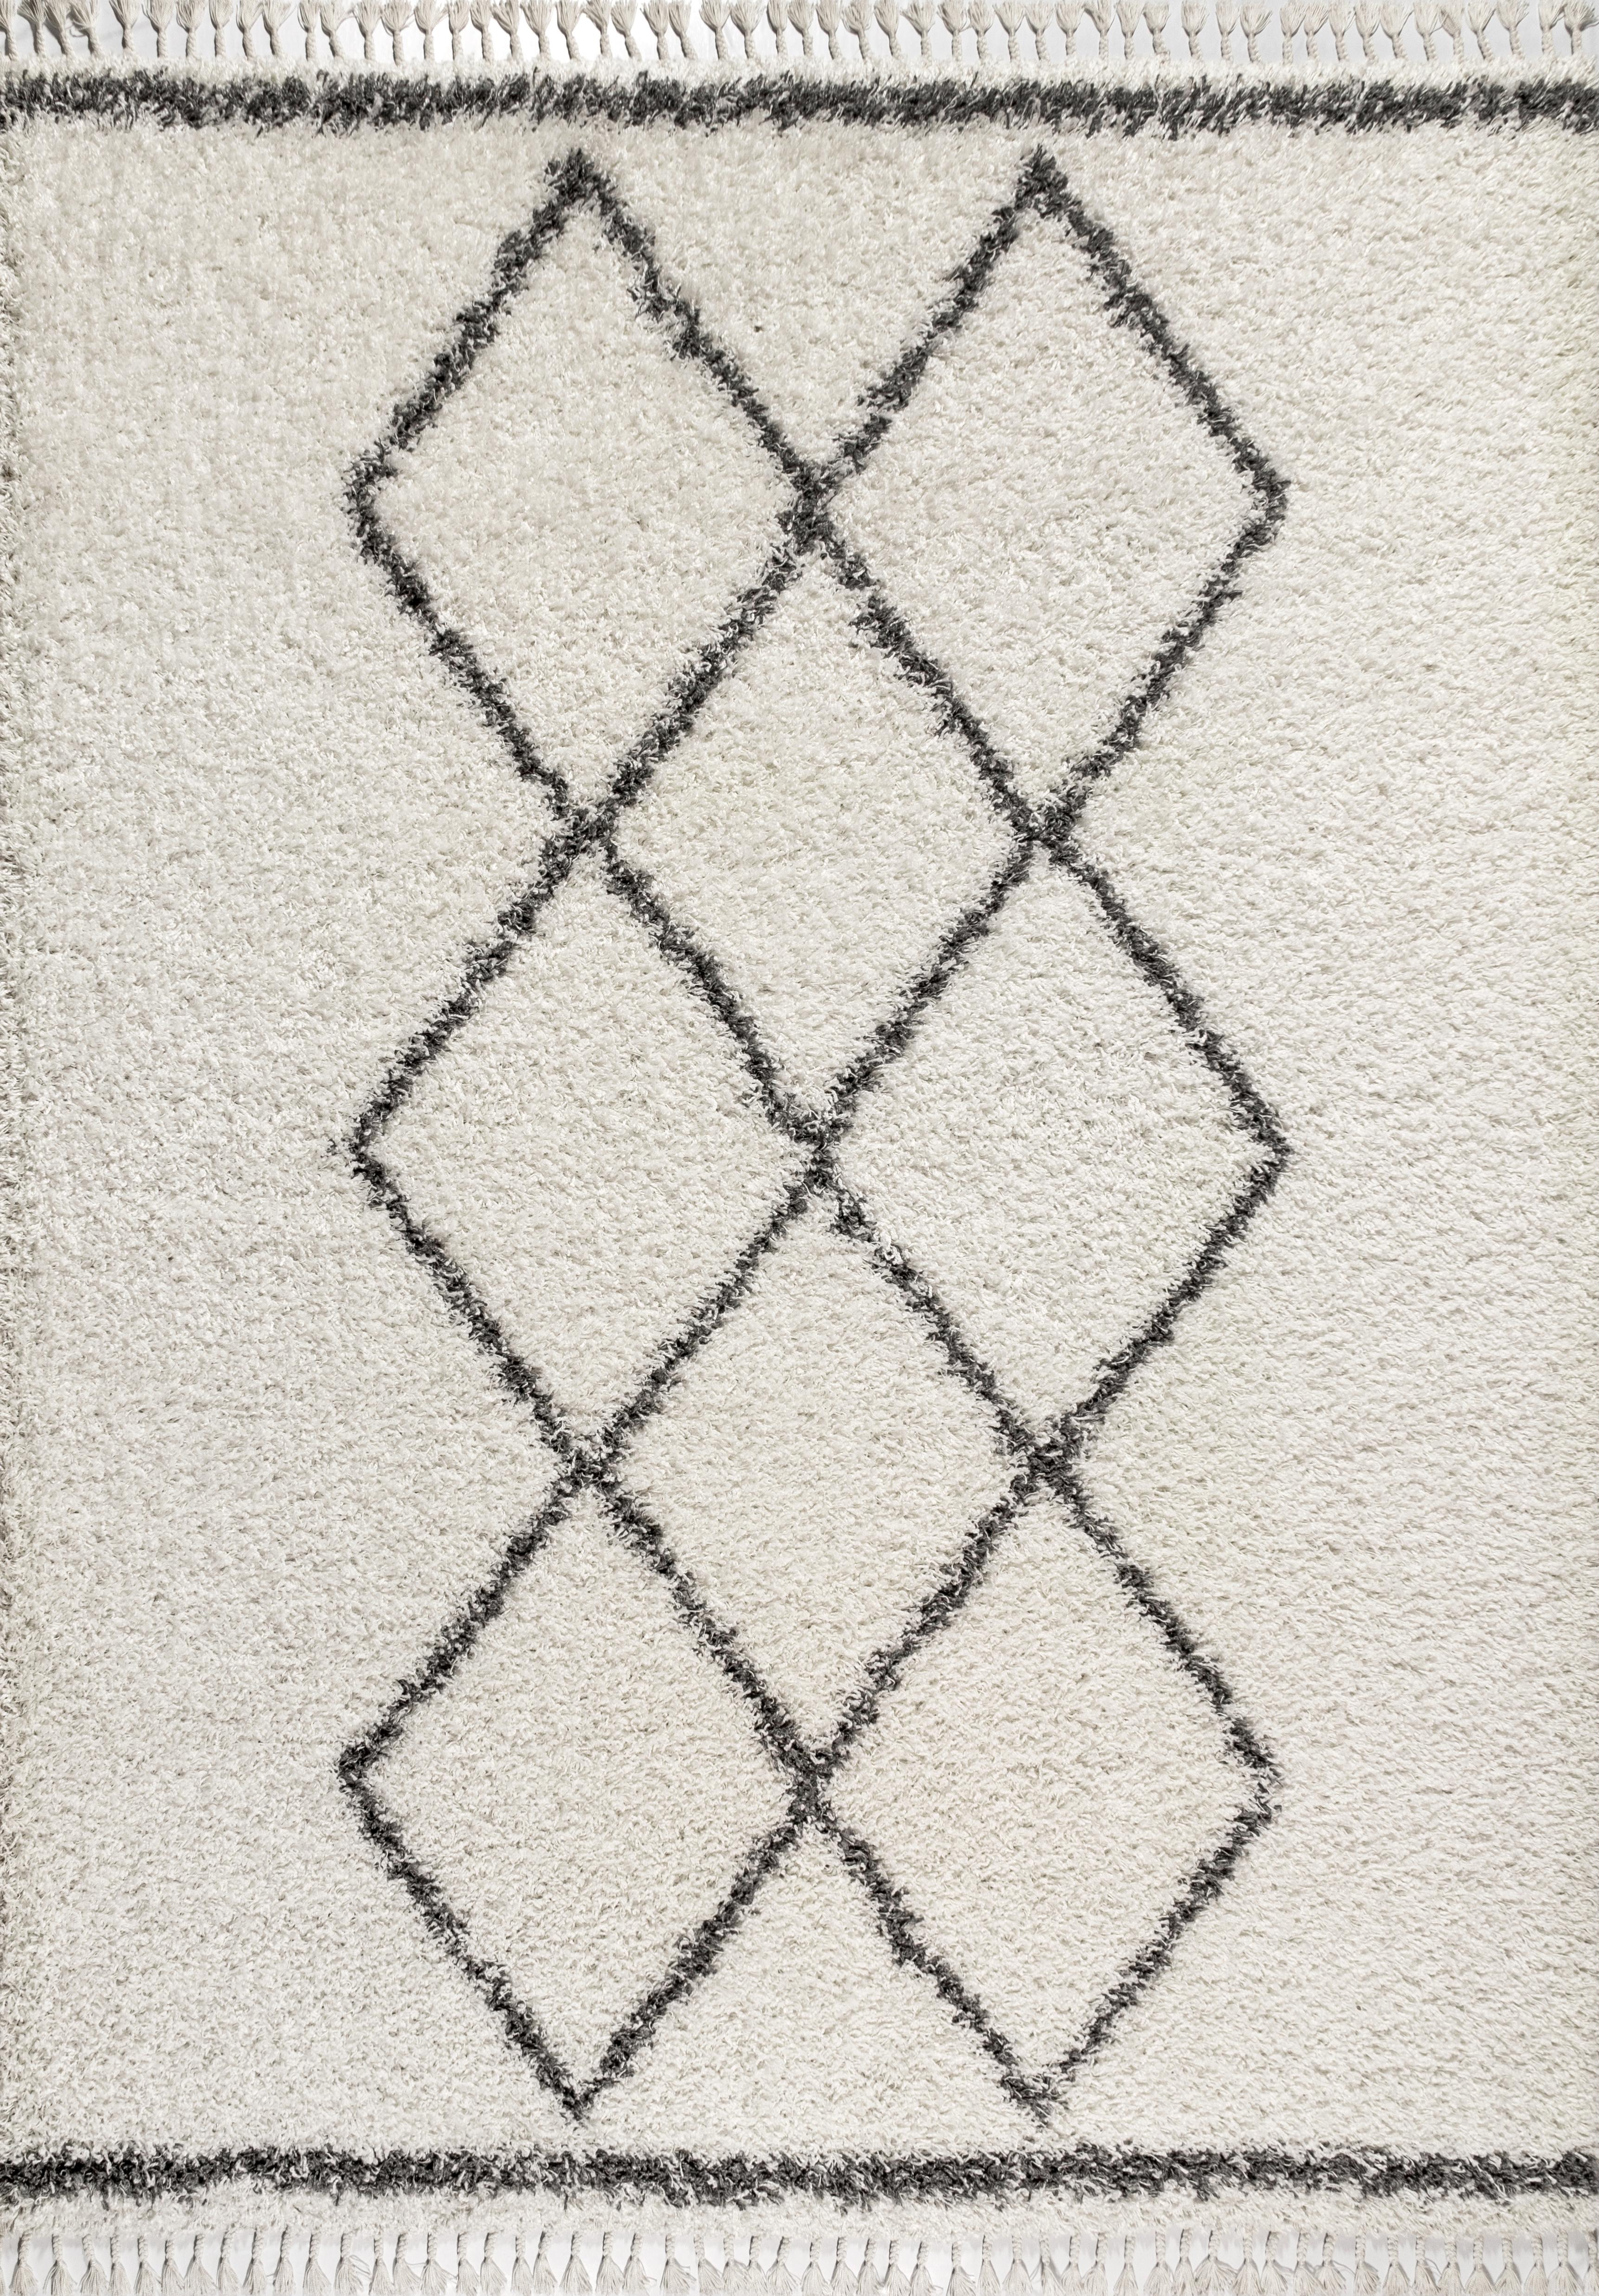 Mercer Shag Plush Tassel Moroccan Tribal Geometric Trellis Cream/Grey 4 ft. x 6 ft. Area Rug